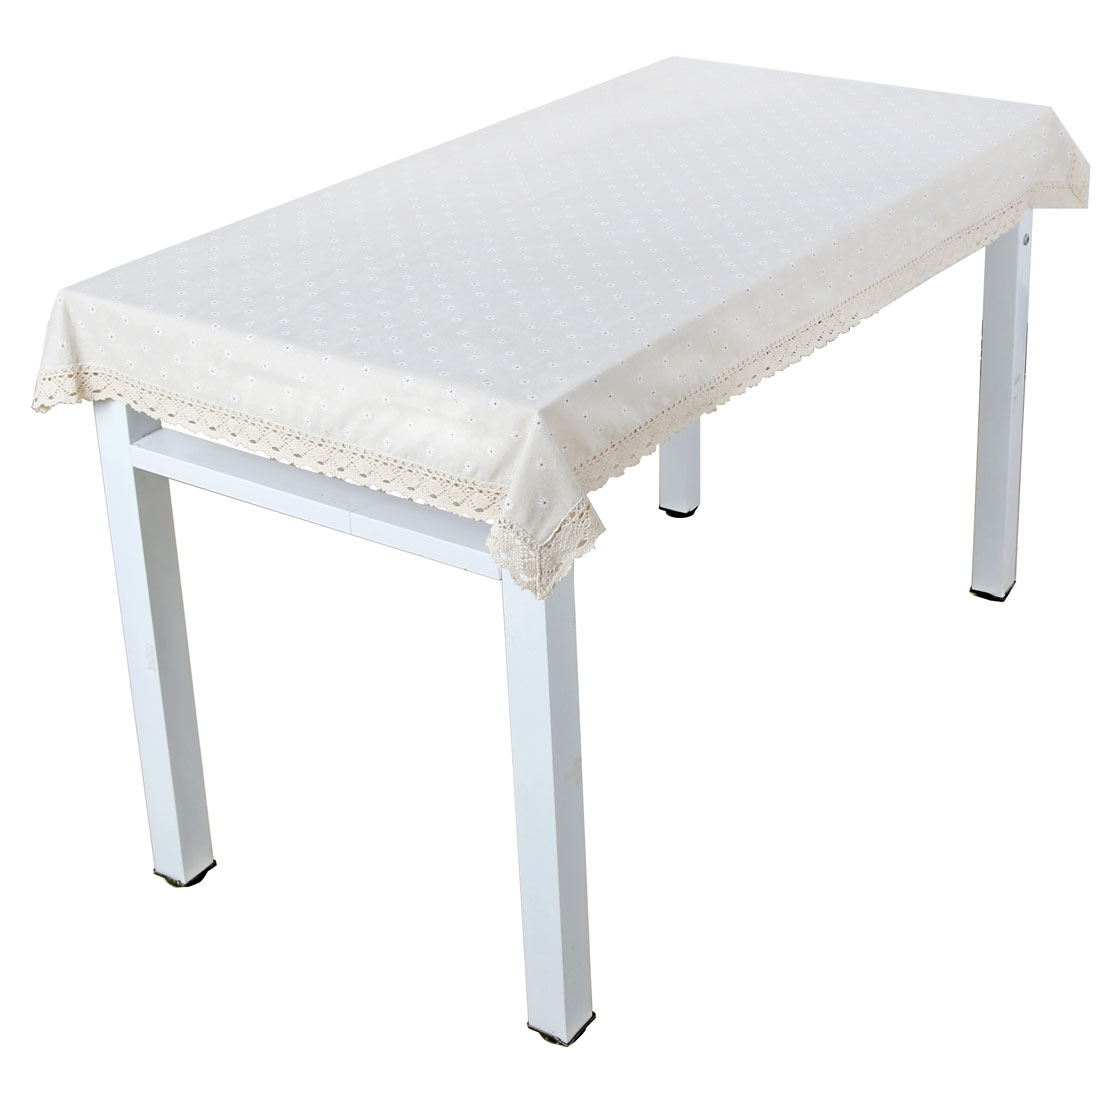 Vintage White Chrysanthemum Tablecloth Cotton Linen Washable Table Cover 140 x 250cm